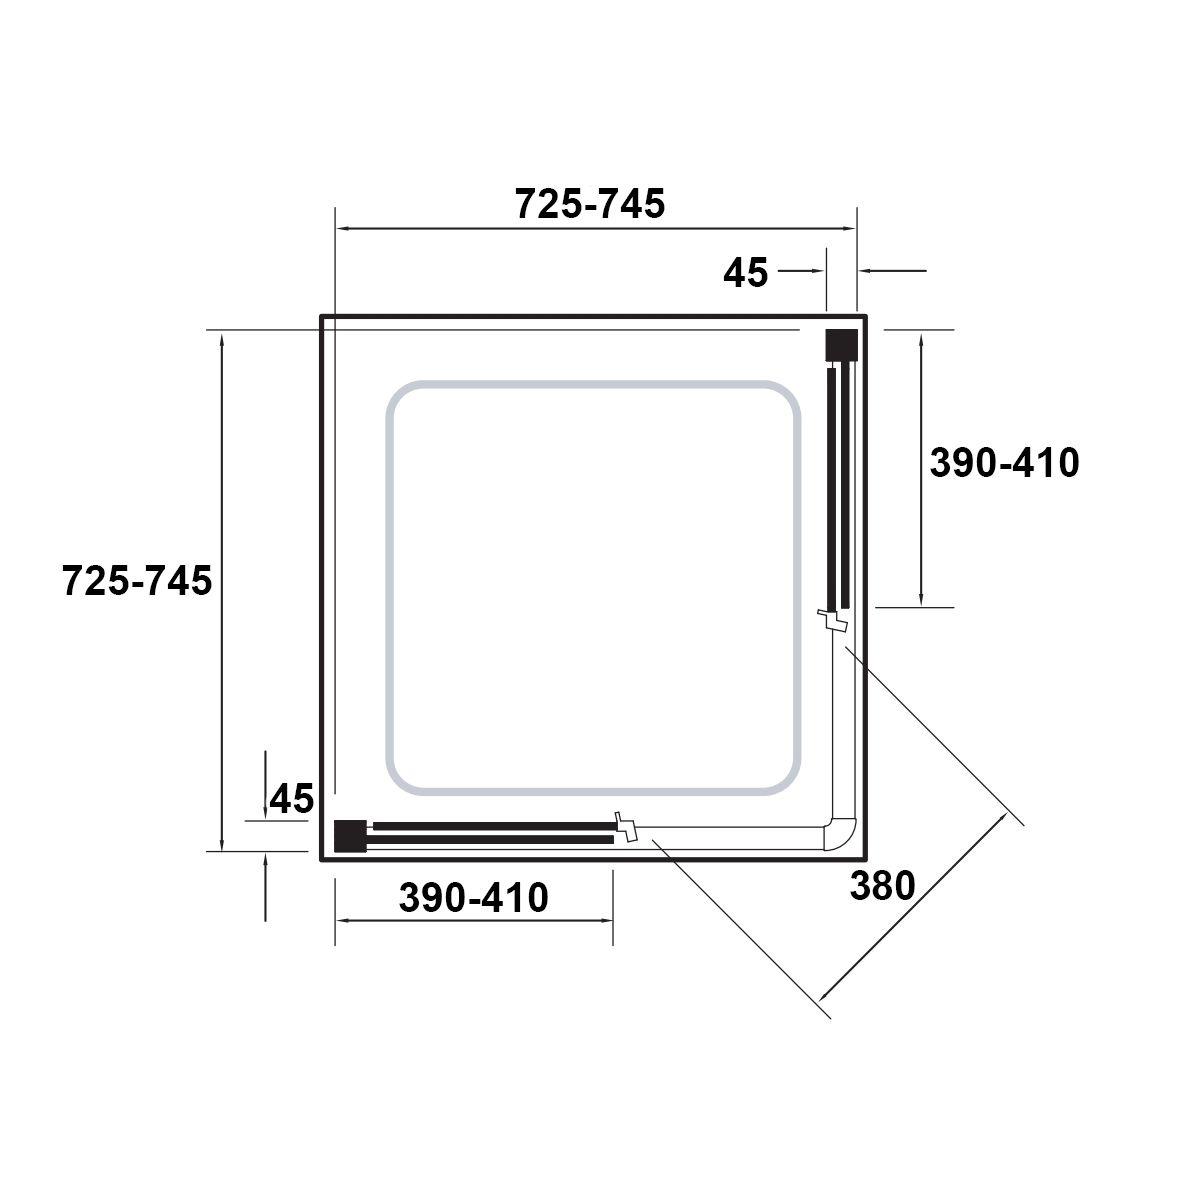 kudosoriginalcornerentryslidingshowerenclosure760x760dimensions